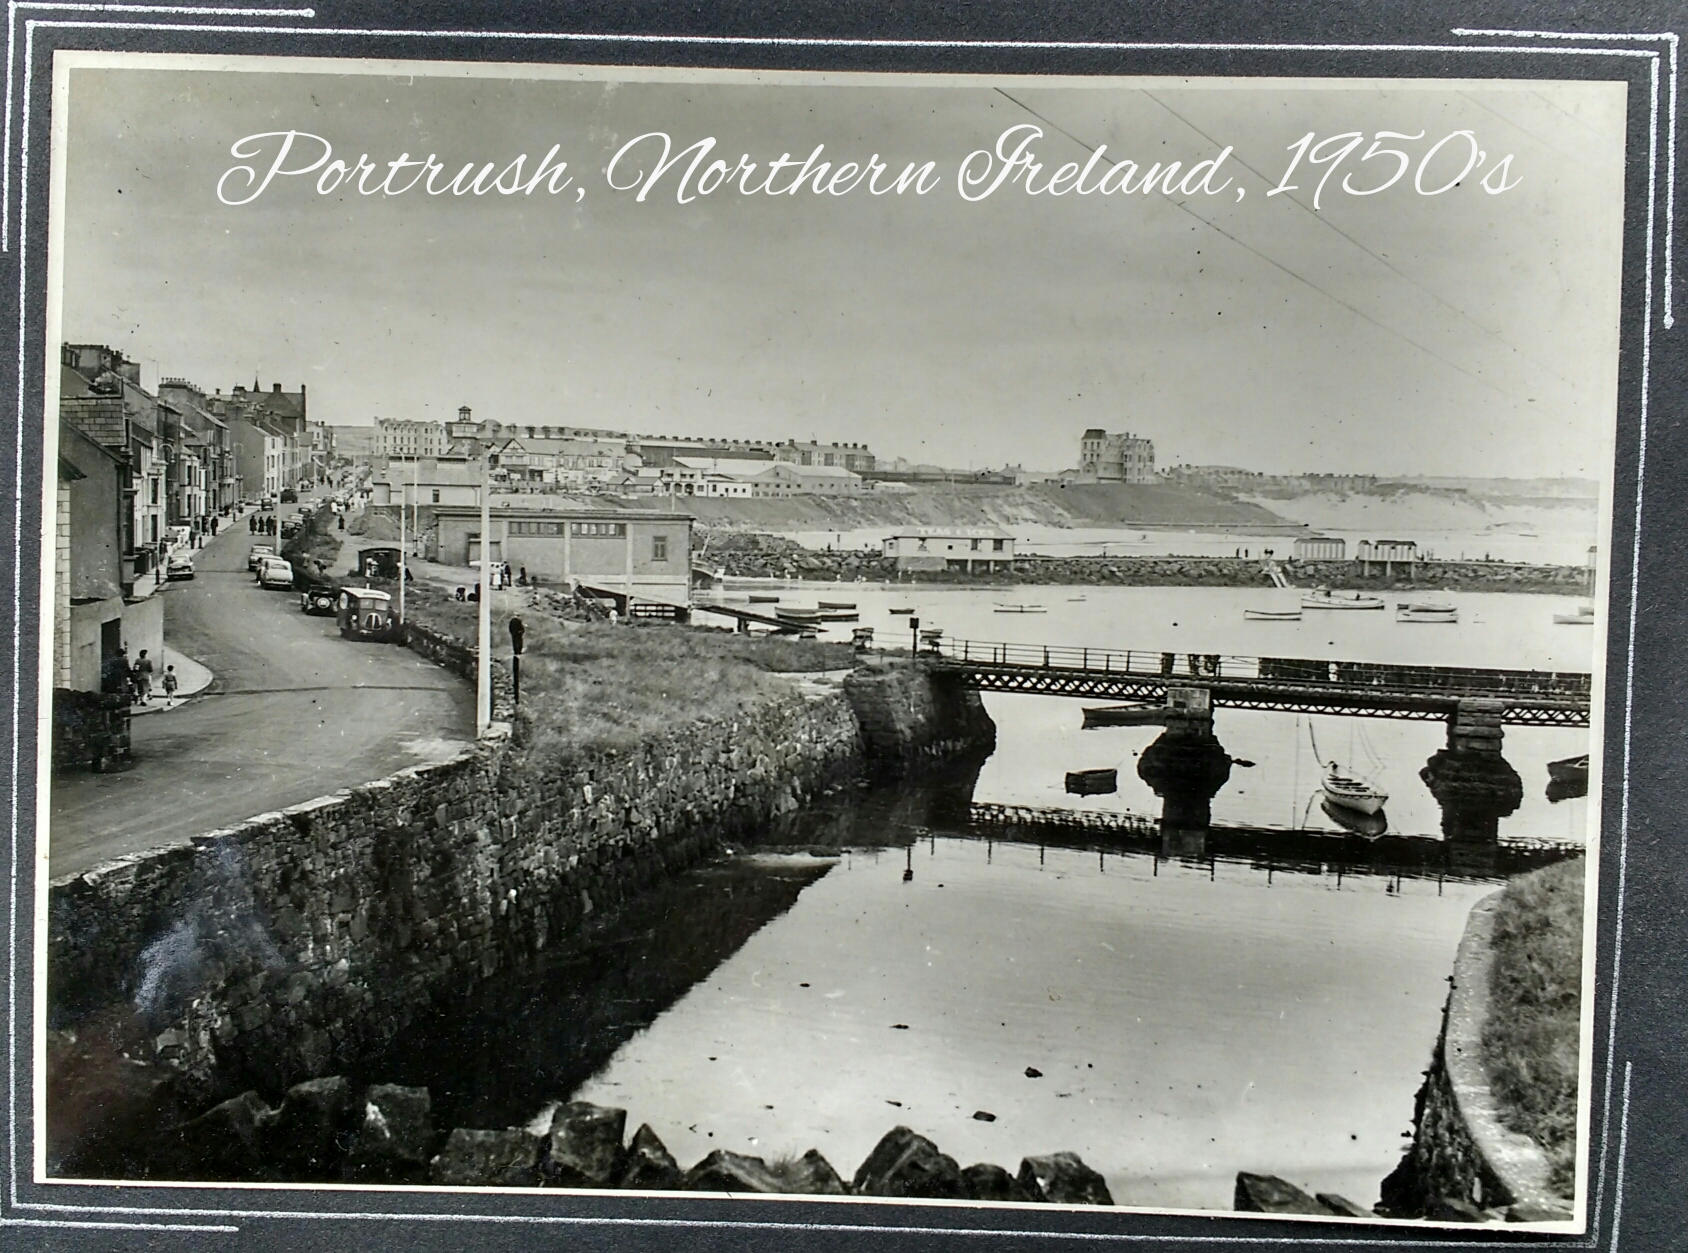 Portrush 1950